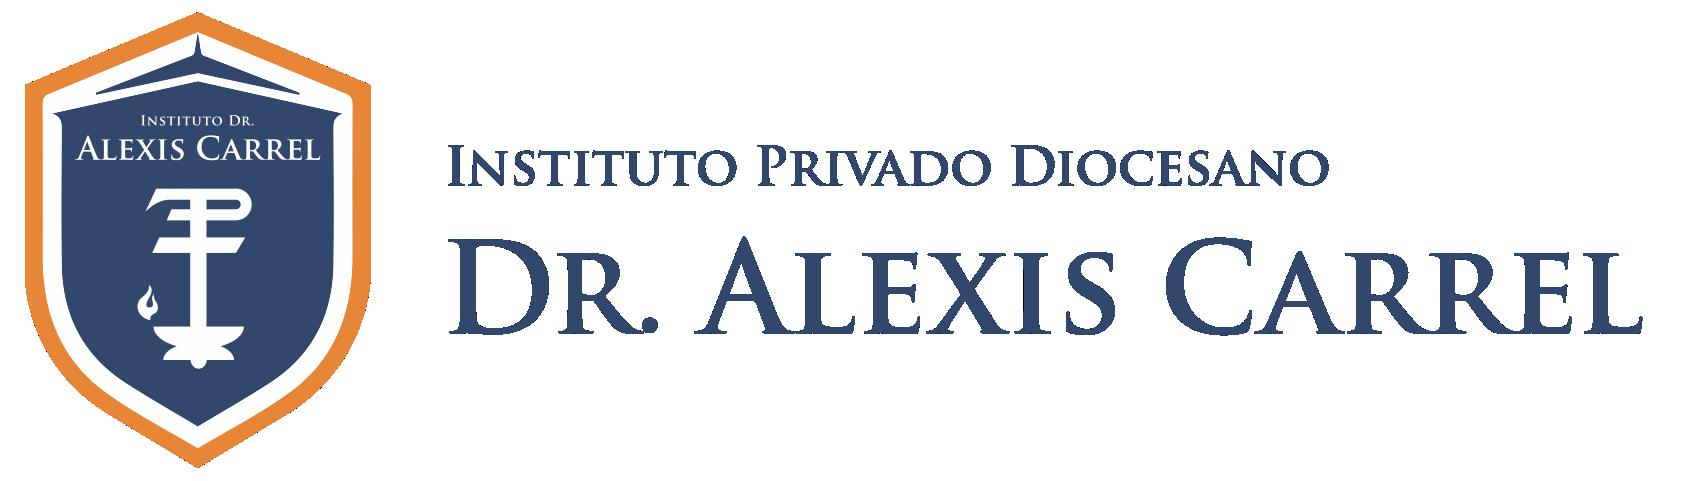 Instituto Privado Diocesano Dr Alexis Carrel